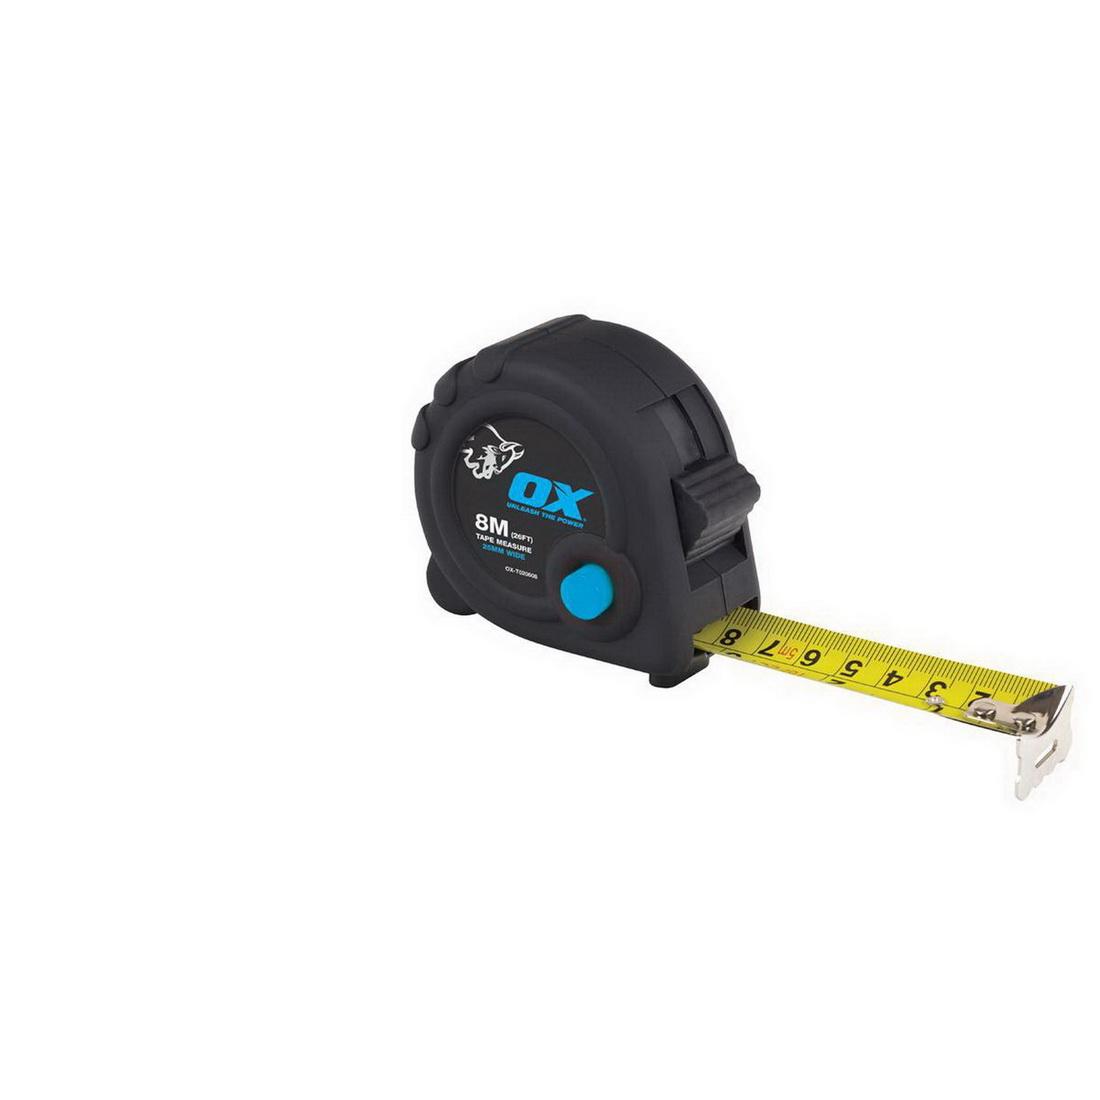 Trade Series 8m Duragrip Tape Measure Nylon Coated Steel